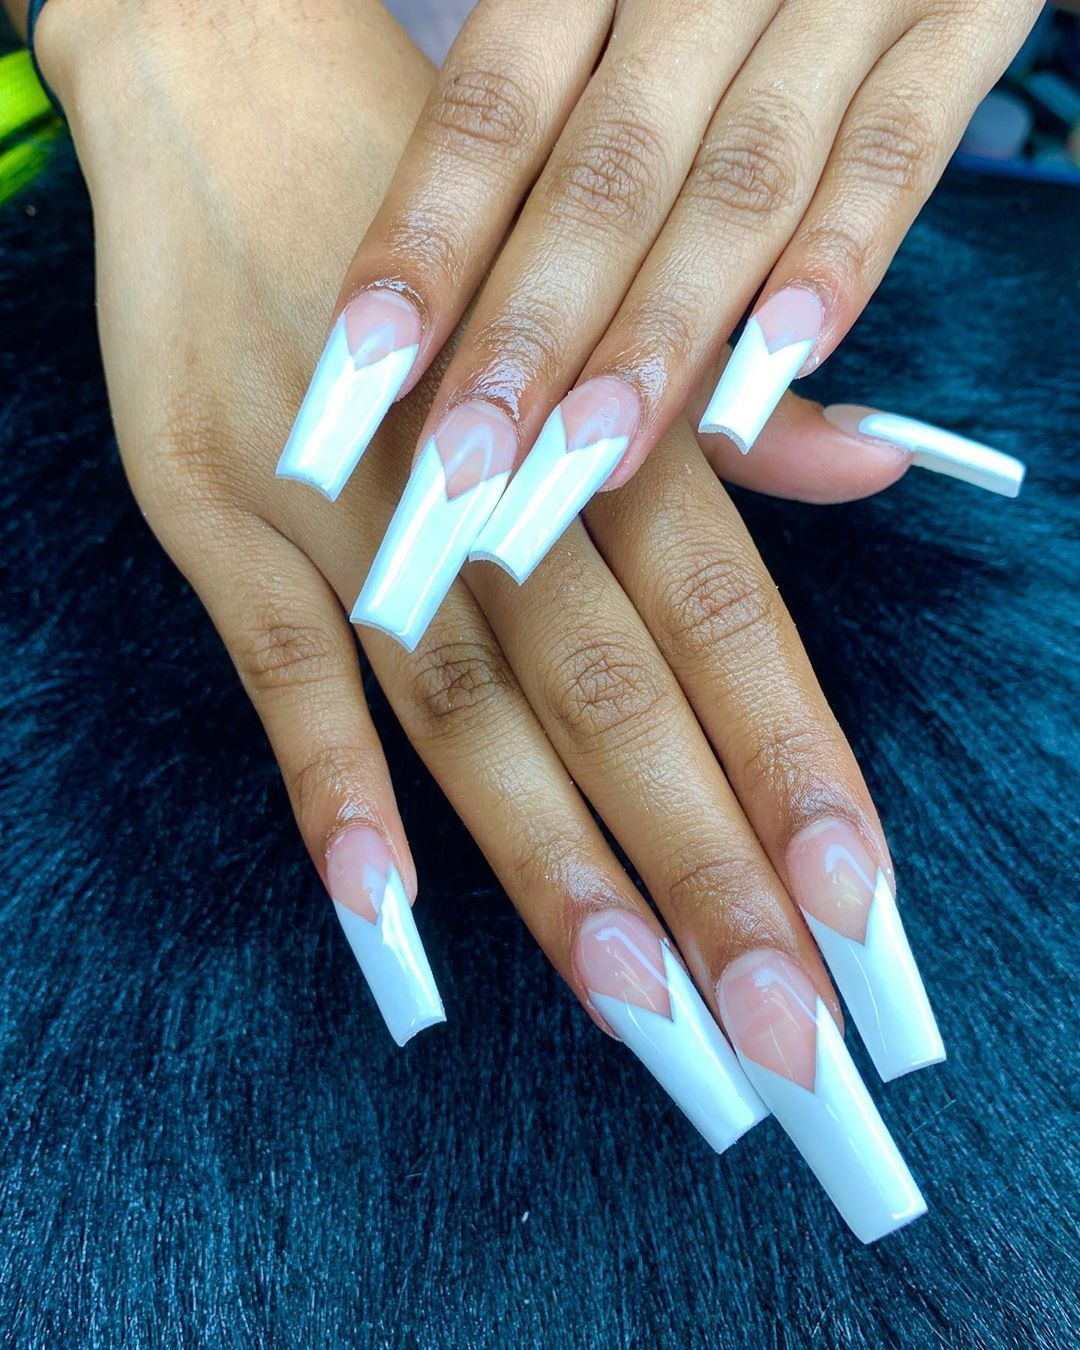 Jahari On Instagram Diamond French Tip Blacknailtech Atlnailtech Nailsofinstagram Nailart Nail Ambre Nails Long Acrylic Nails French Acrylic Nails